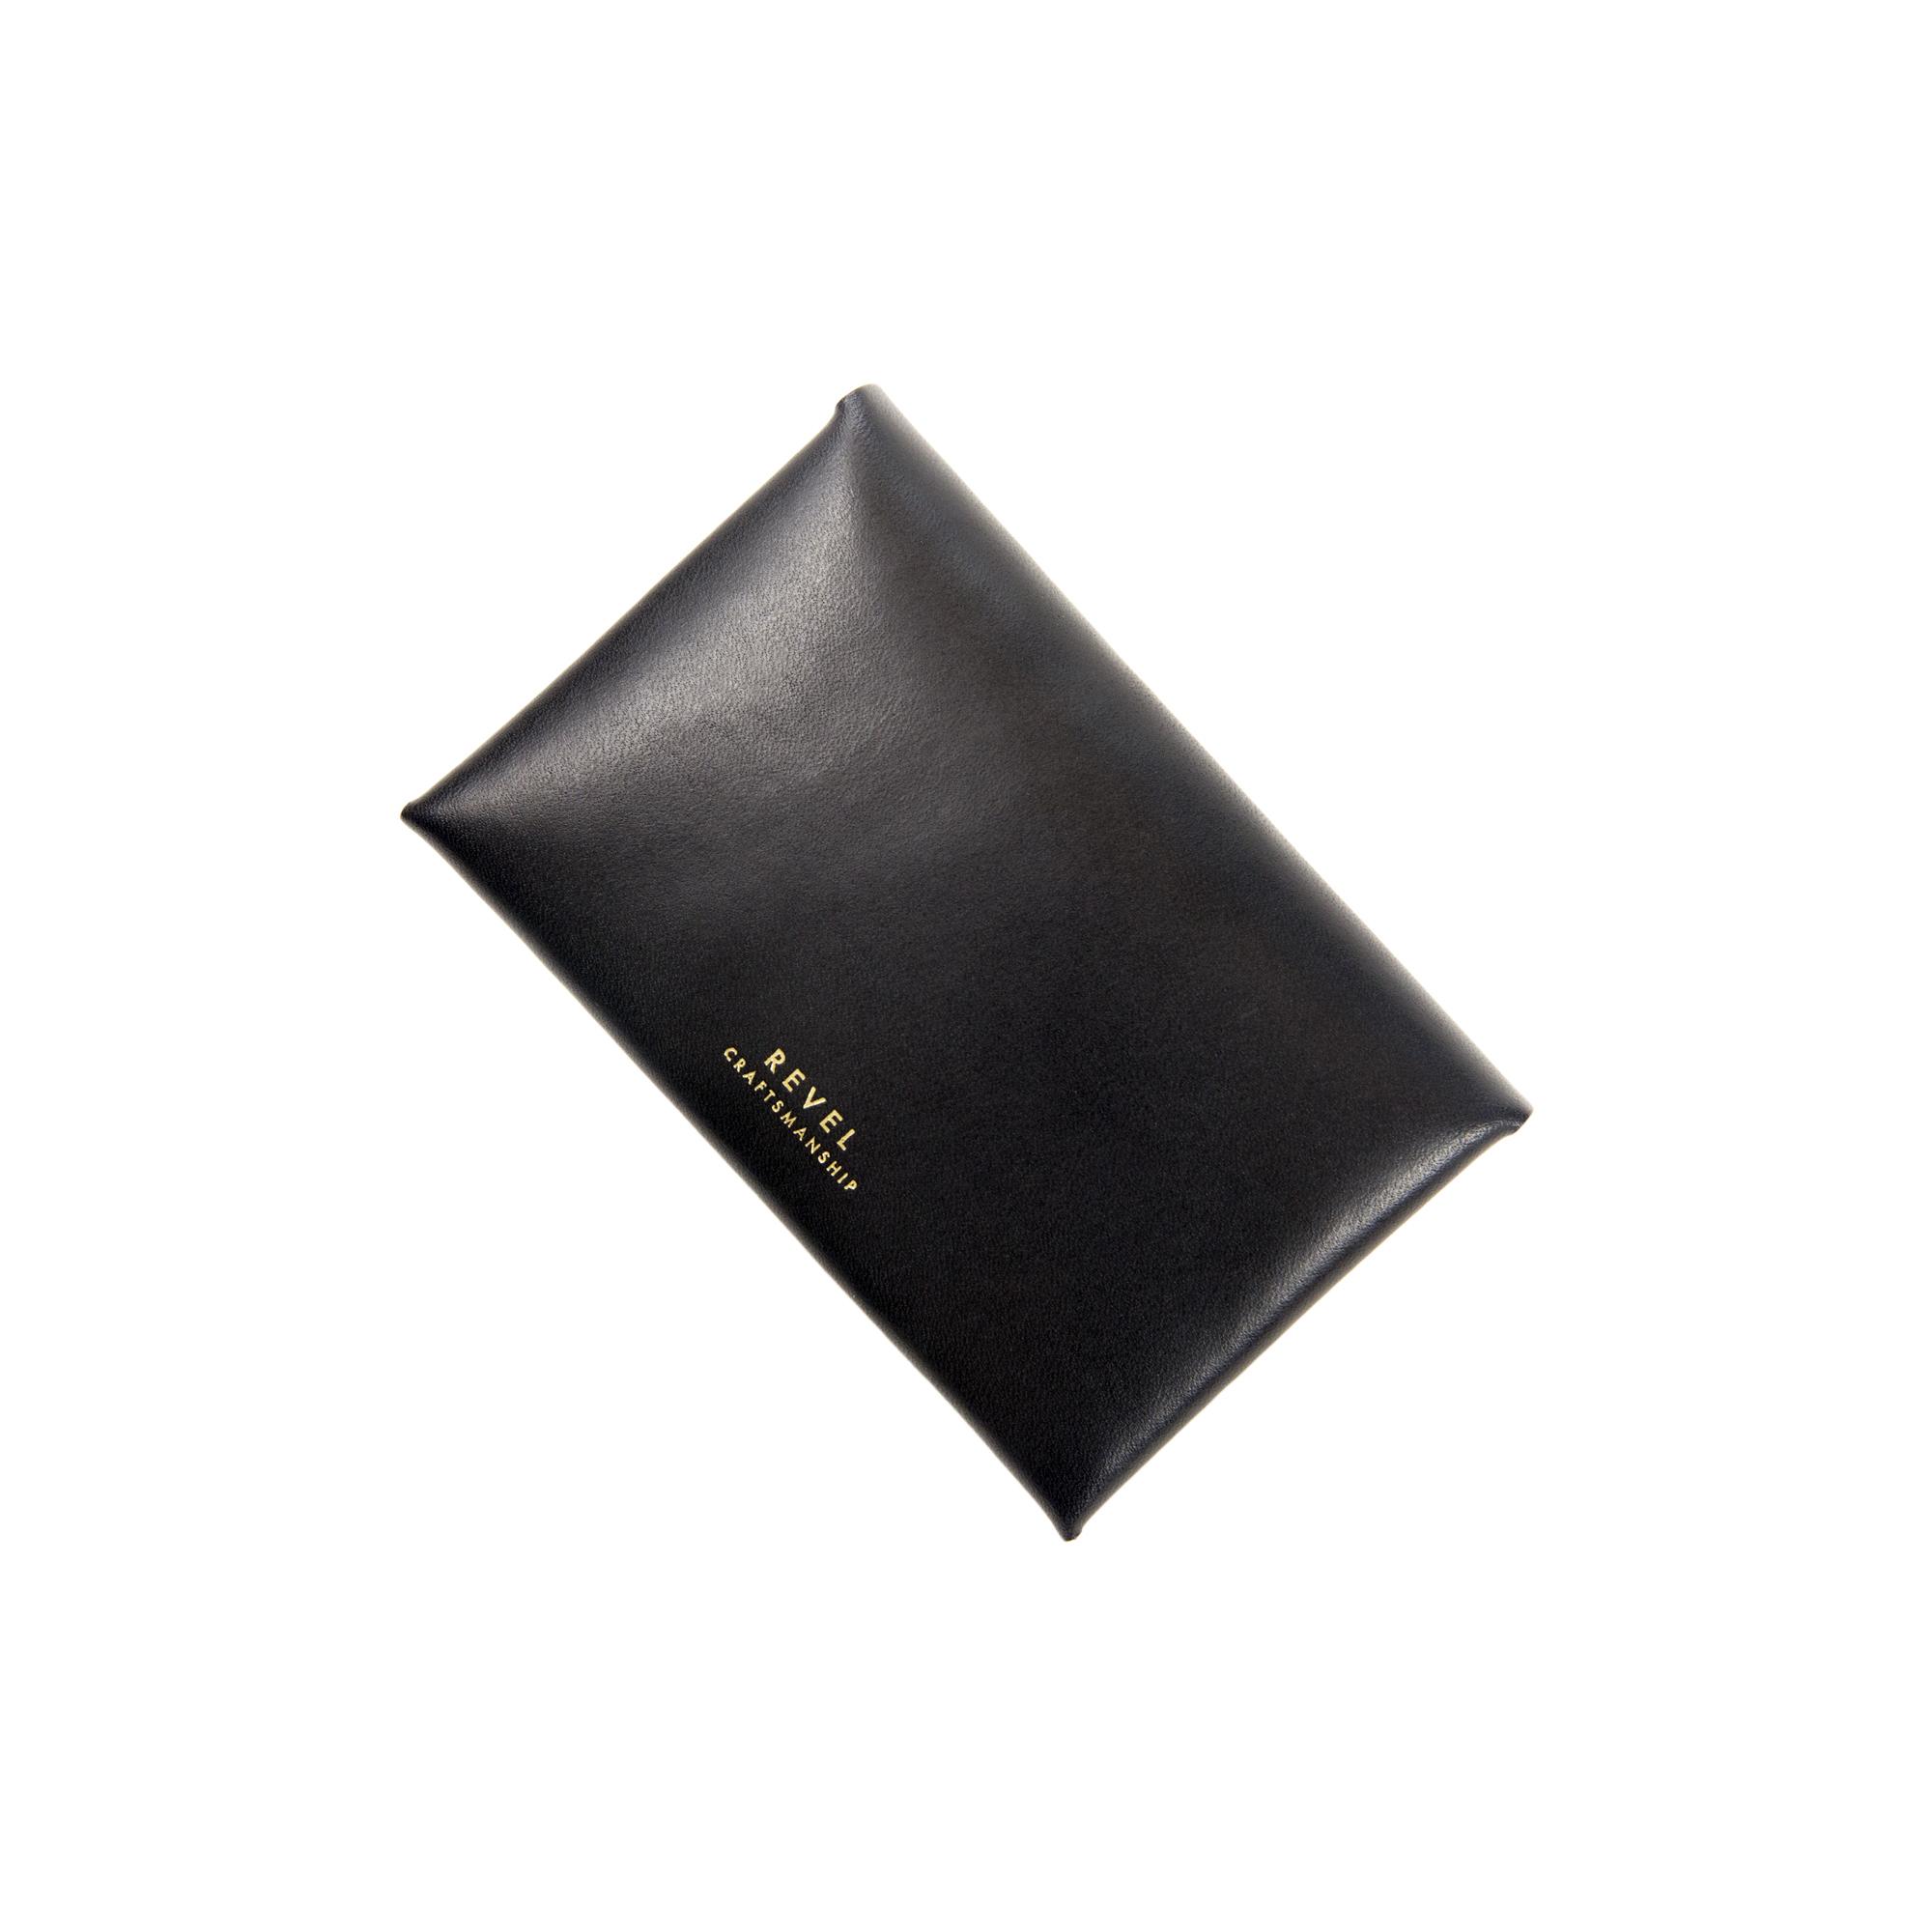 SLIM CARD CASE BLACK [EST OIL]